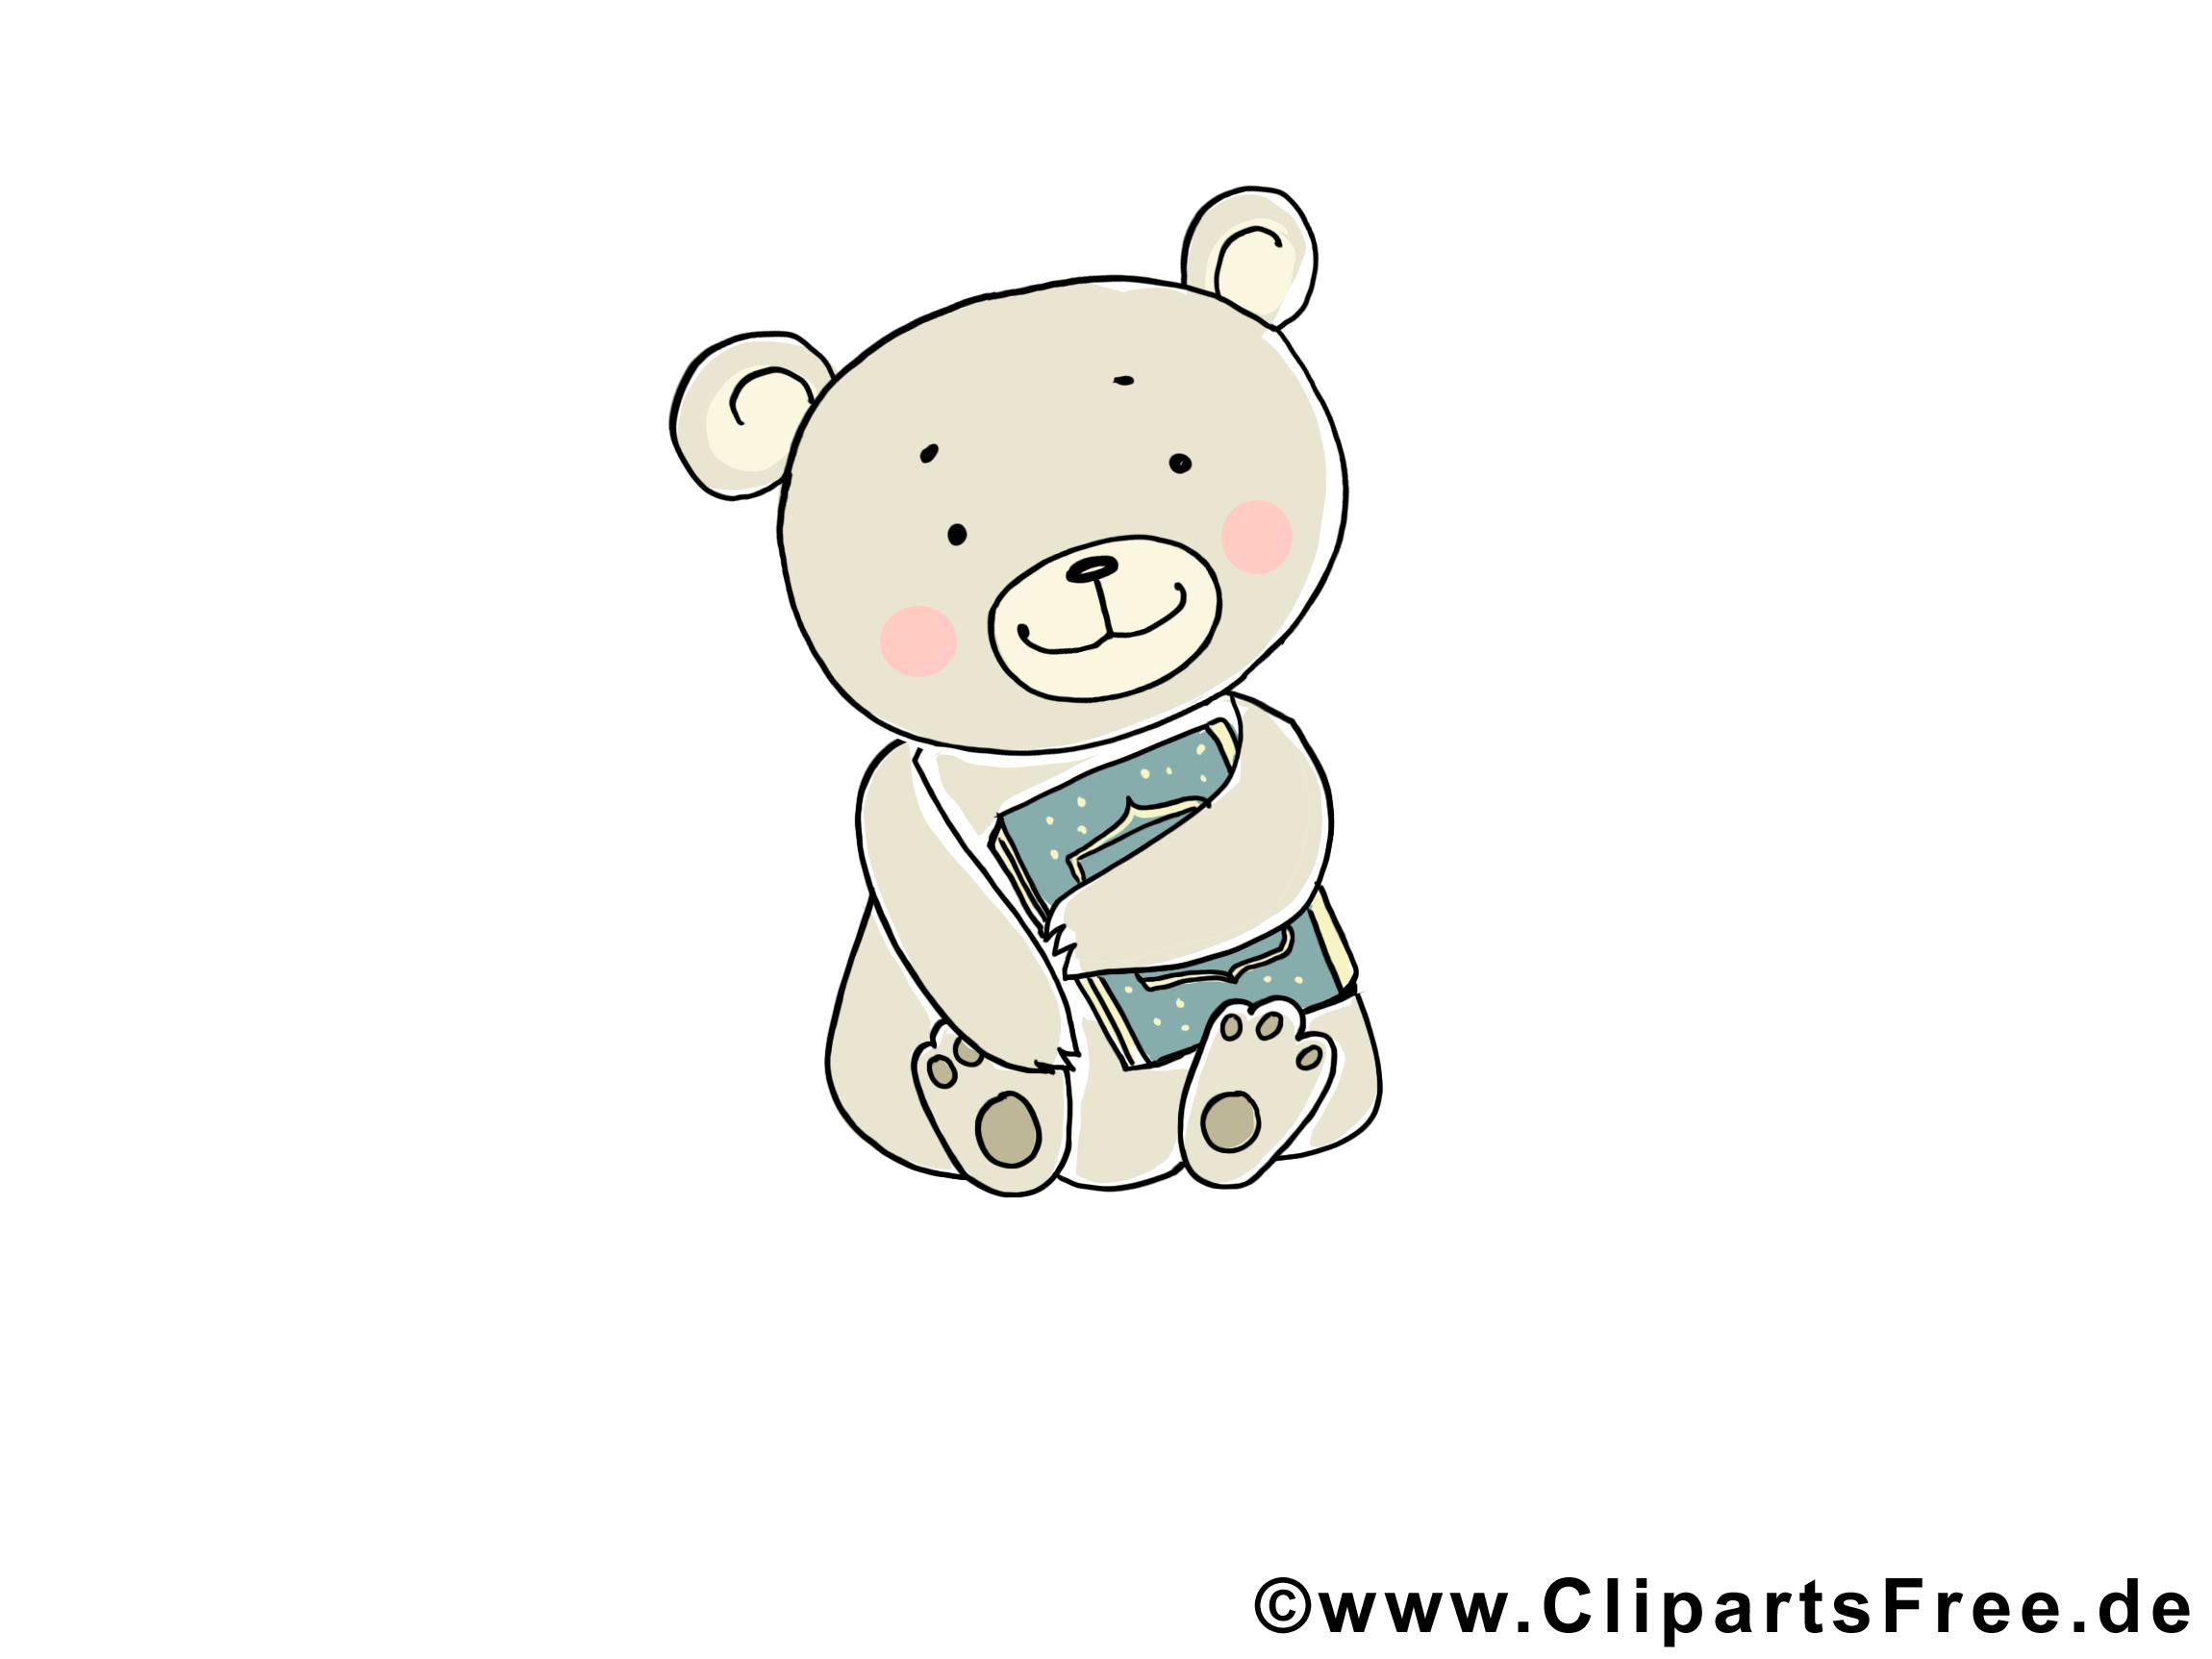 Suesse Tiere Teddybaer